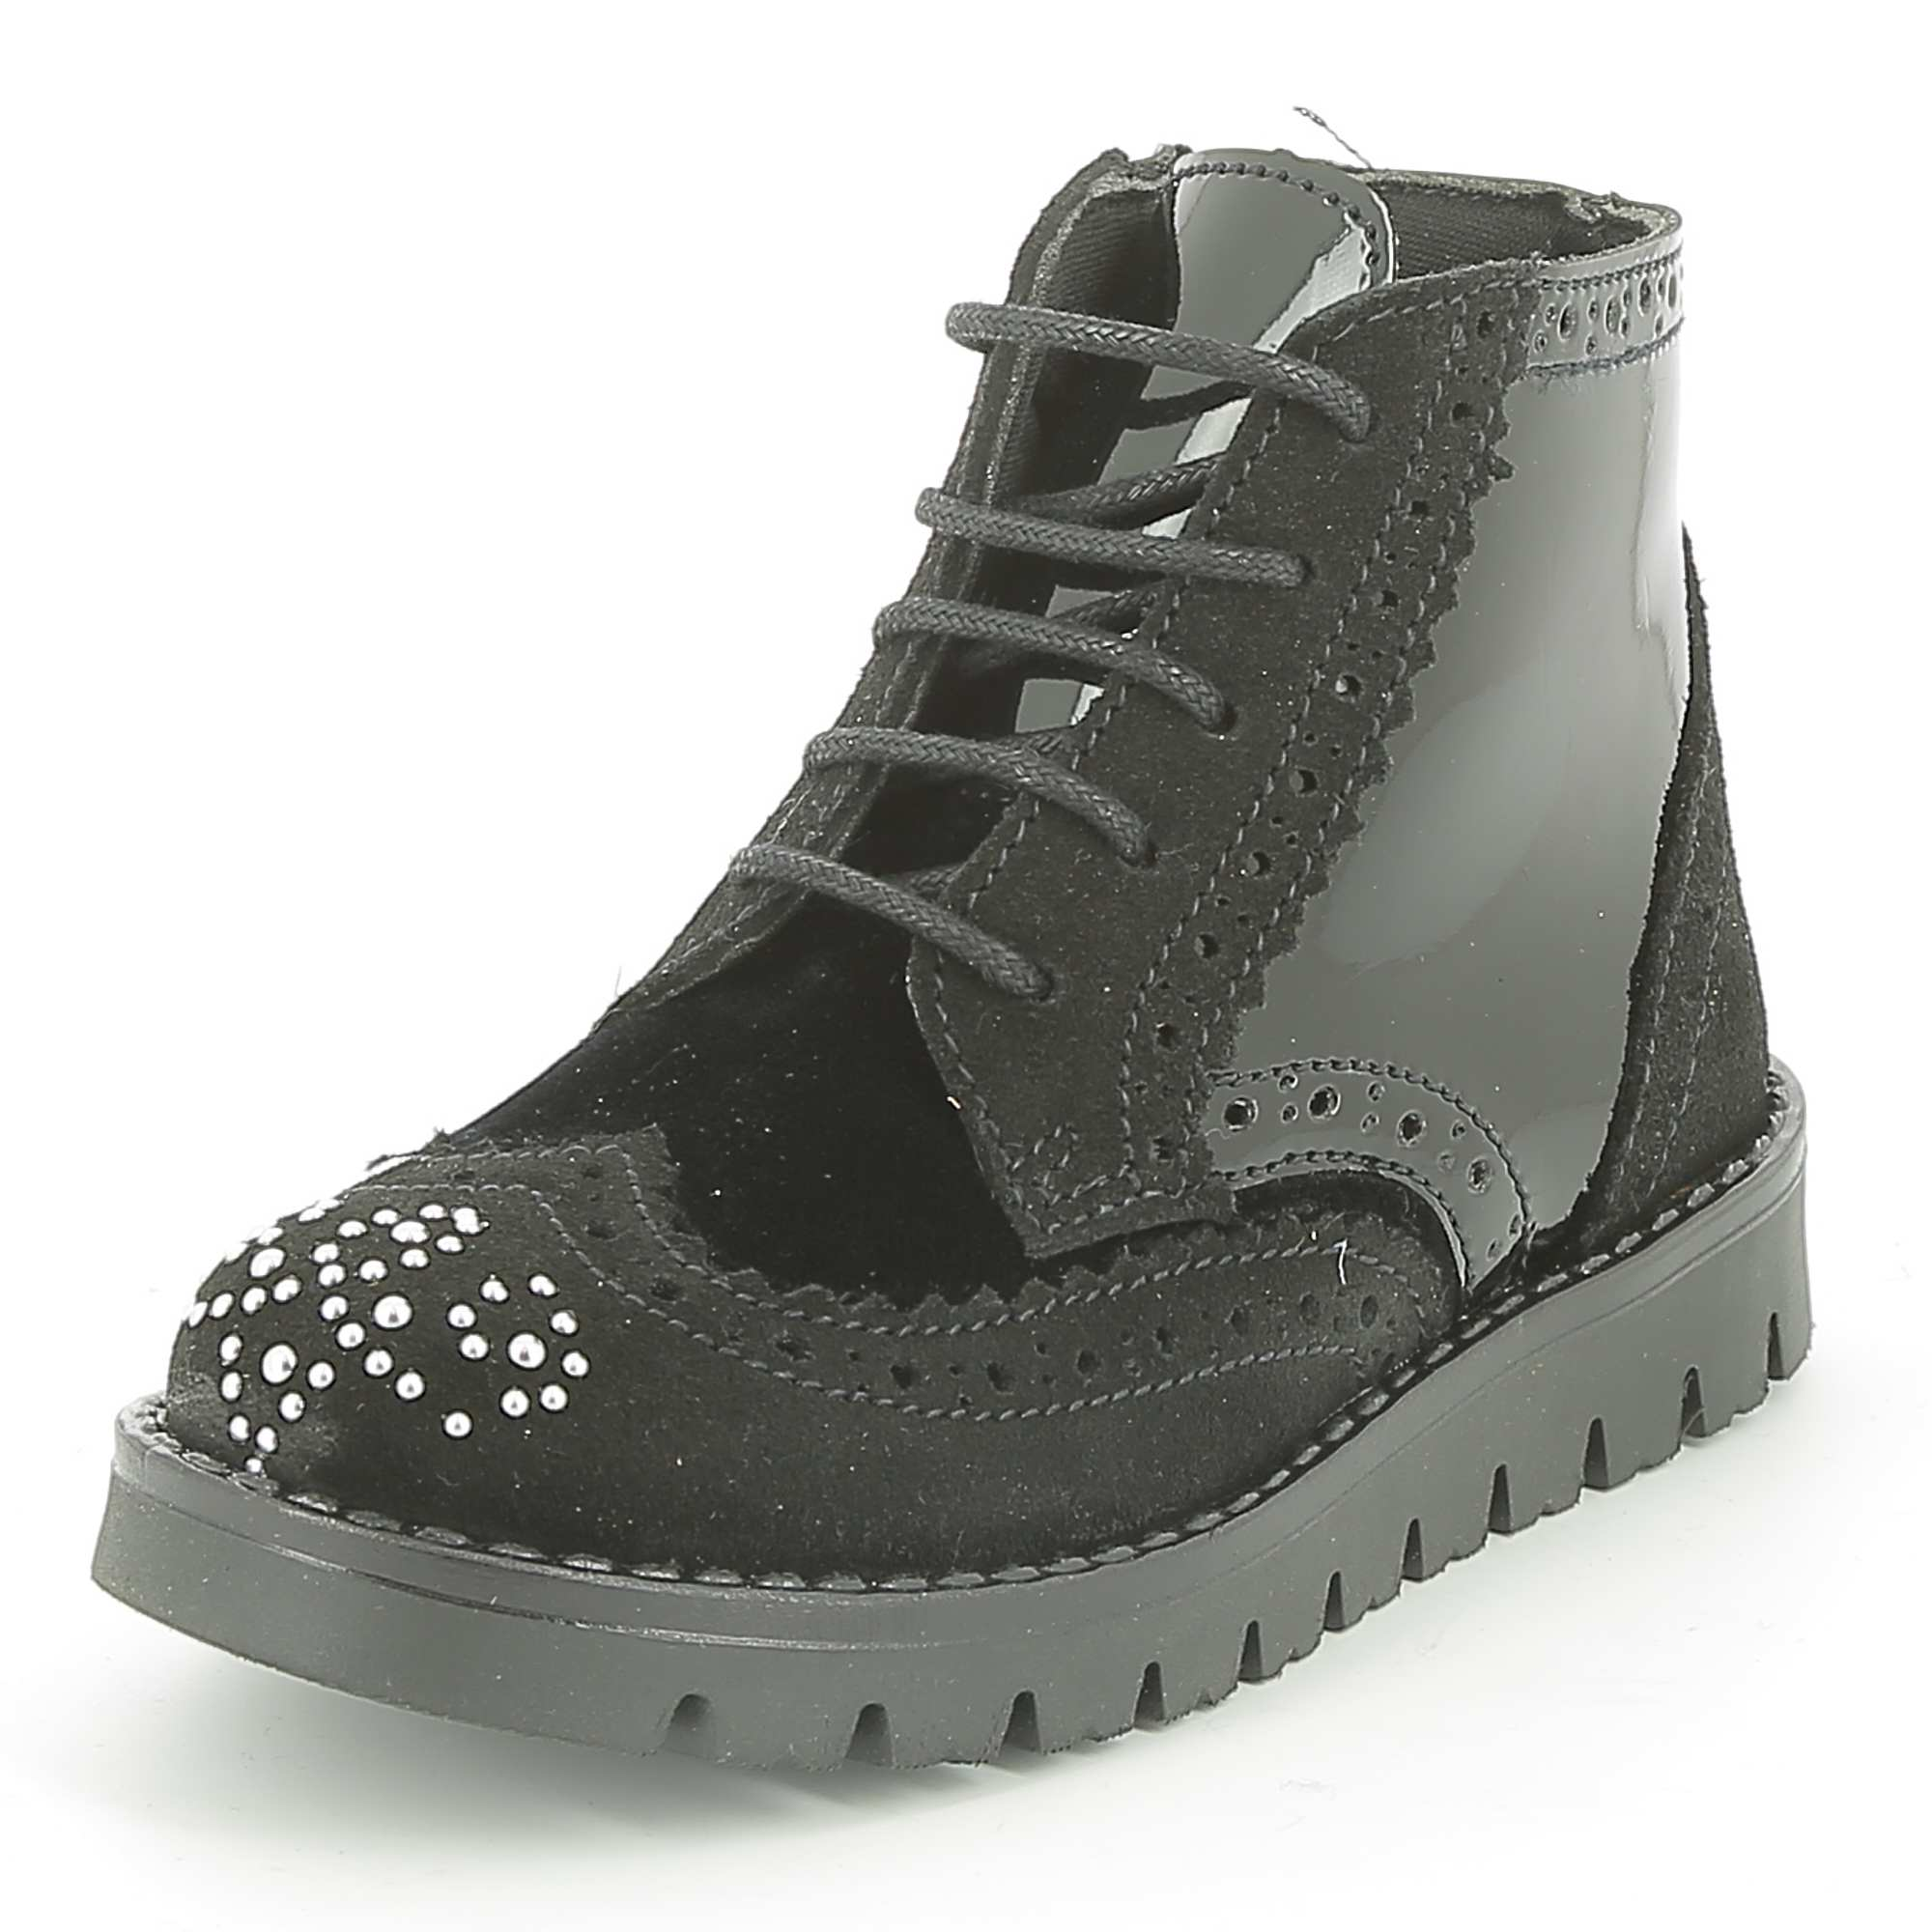 boots en cuir style richelieu fille noir kiabi 38 00. Black Bedroom Furniture Sets. Home Design Ideas